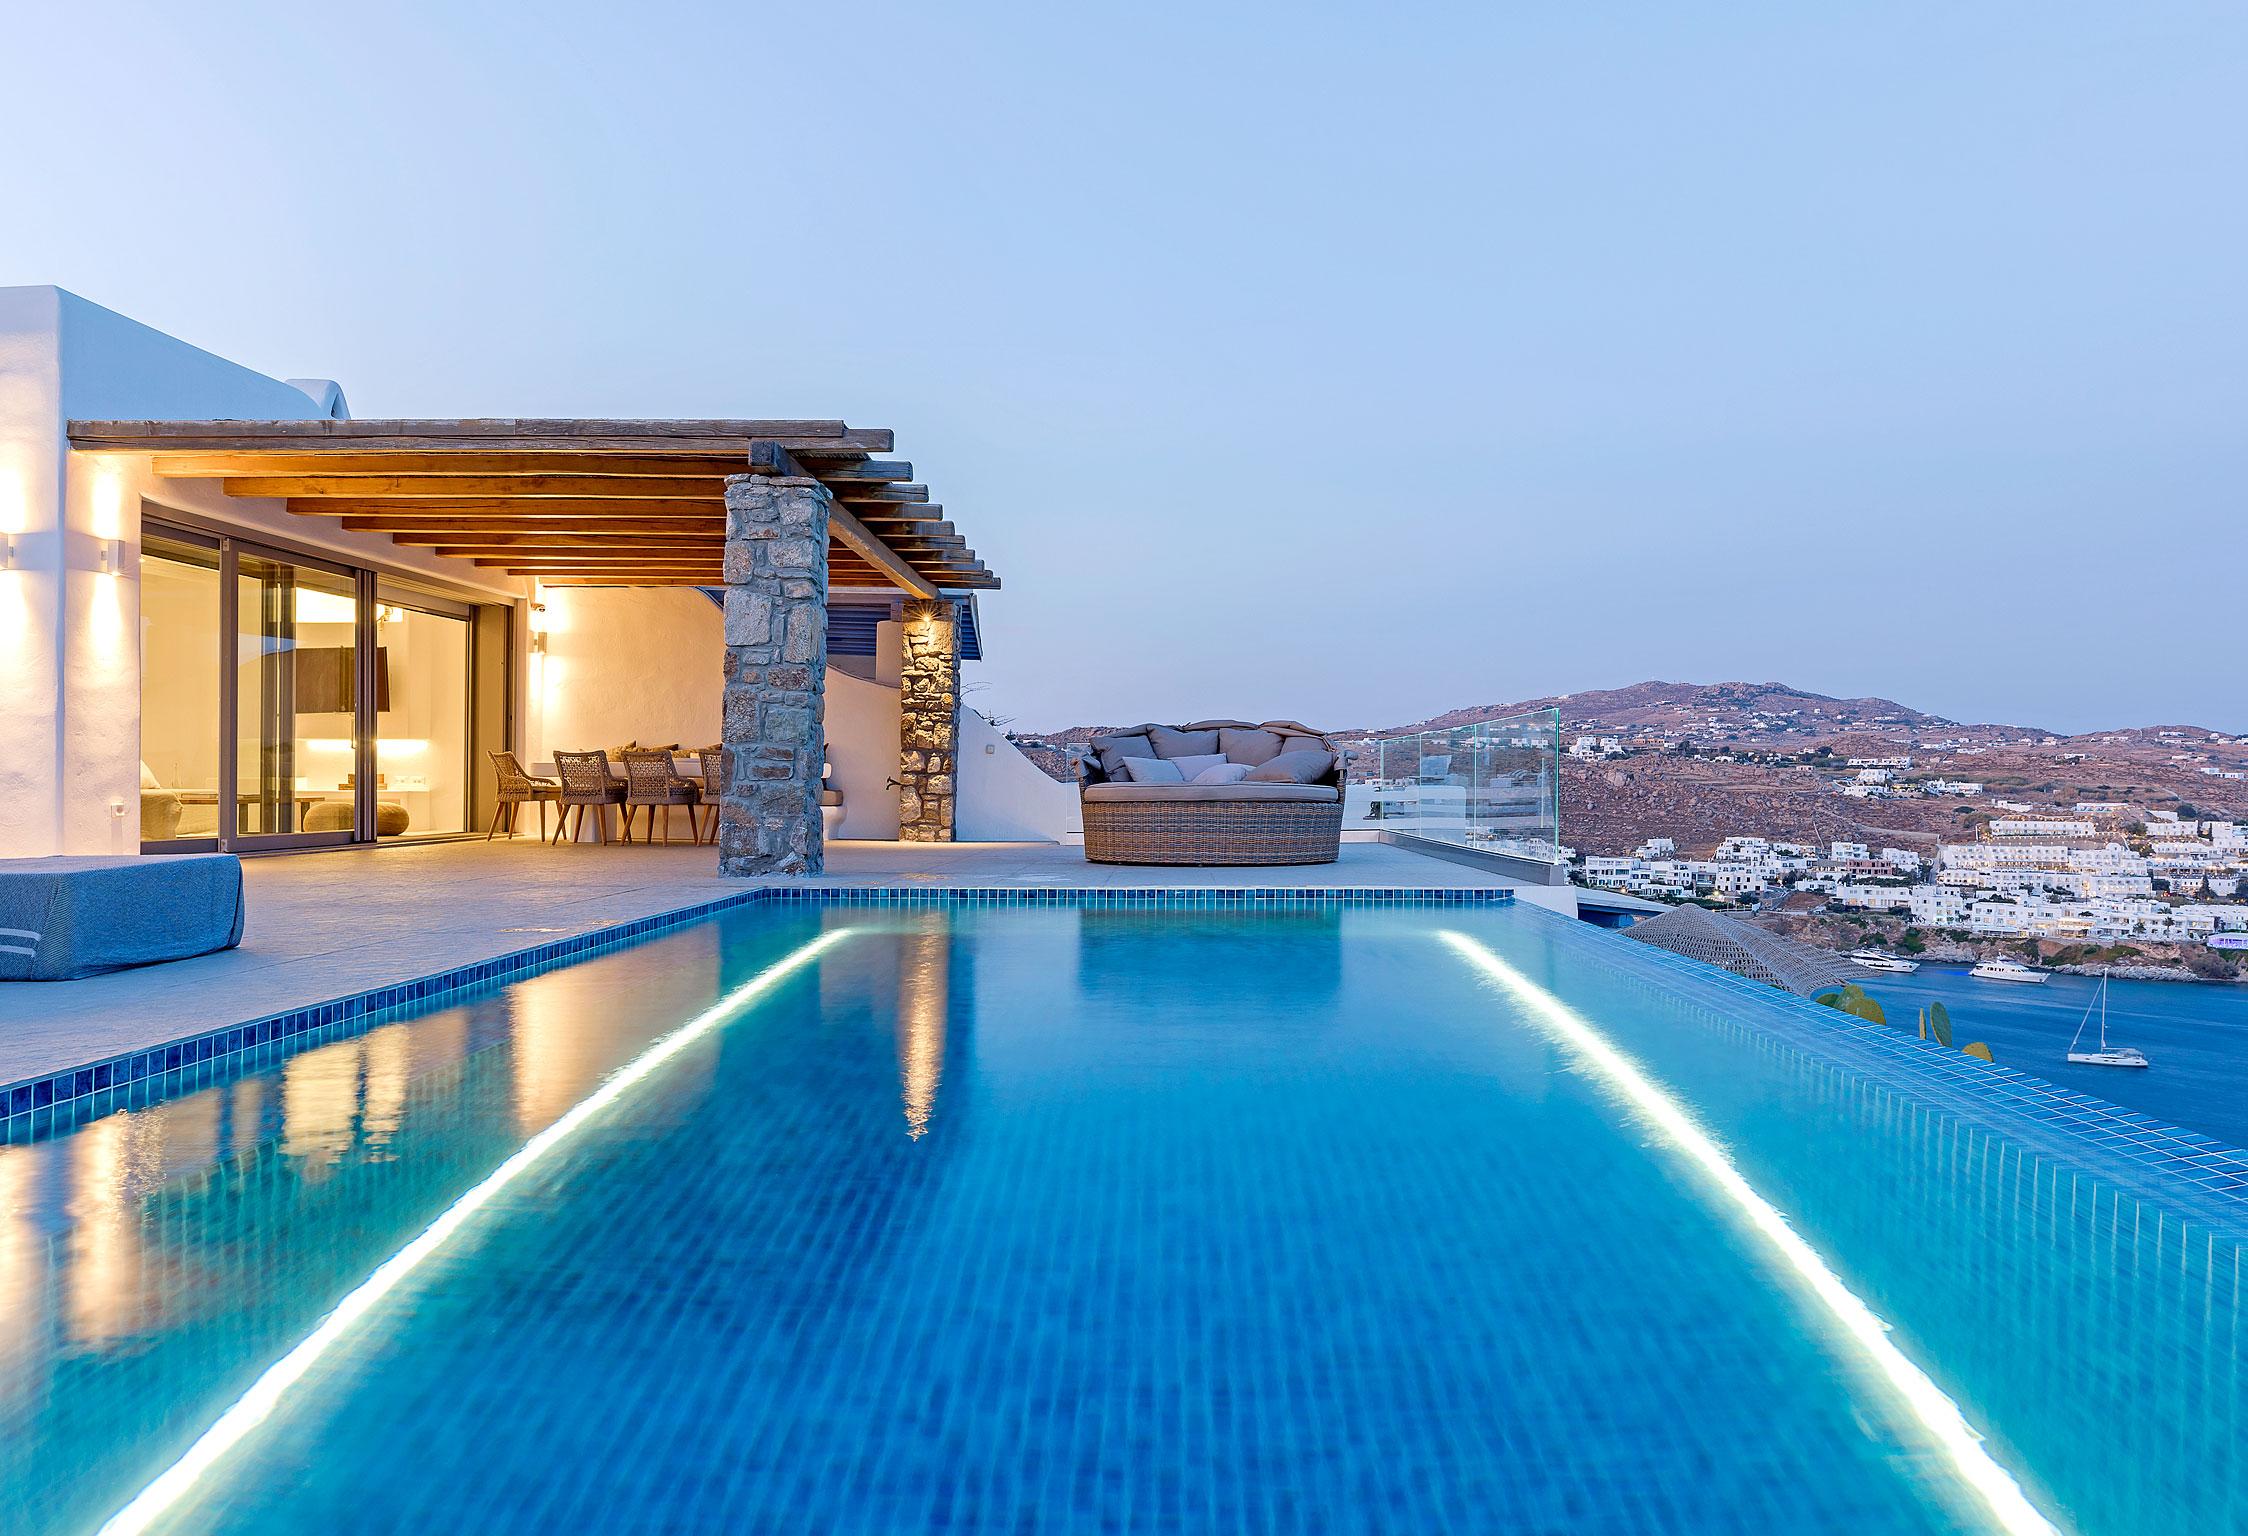 Mykonos Villa Delfine jumbotron image